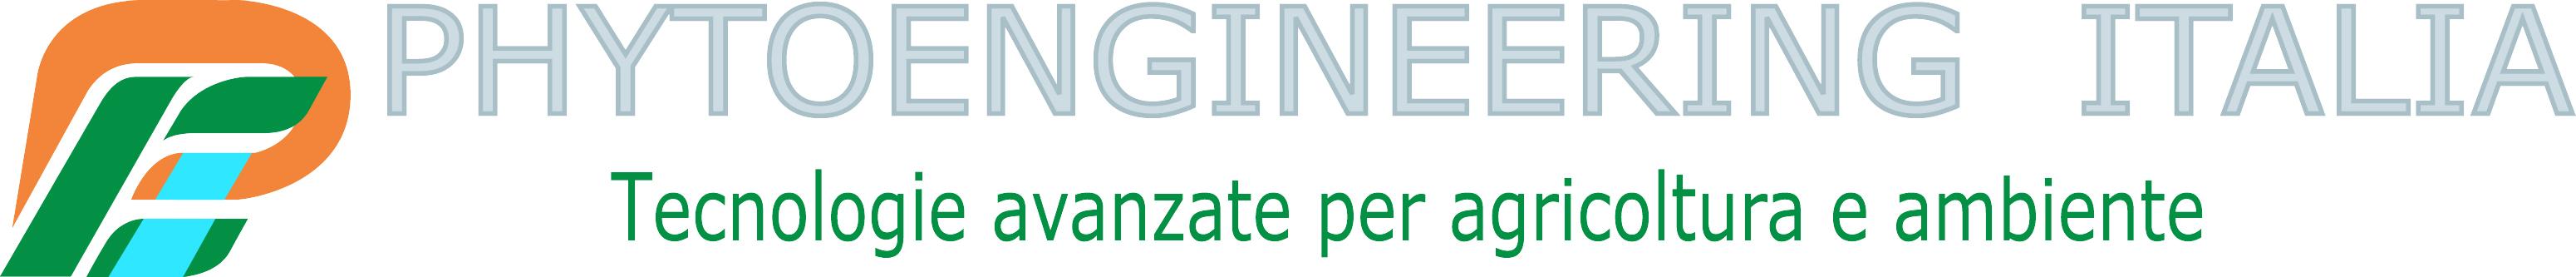 phytoengineering-italia-srl